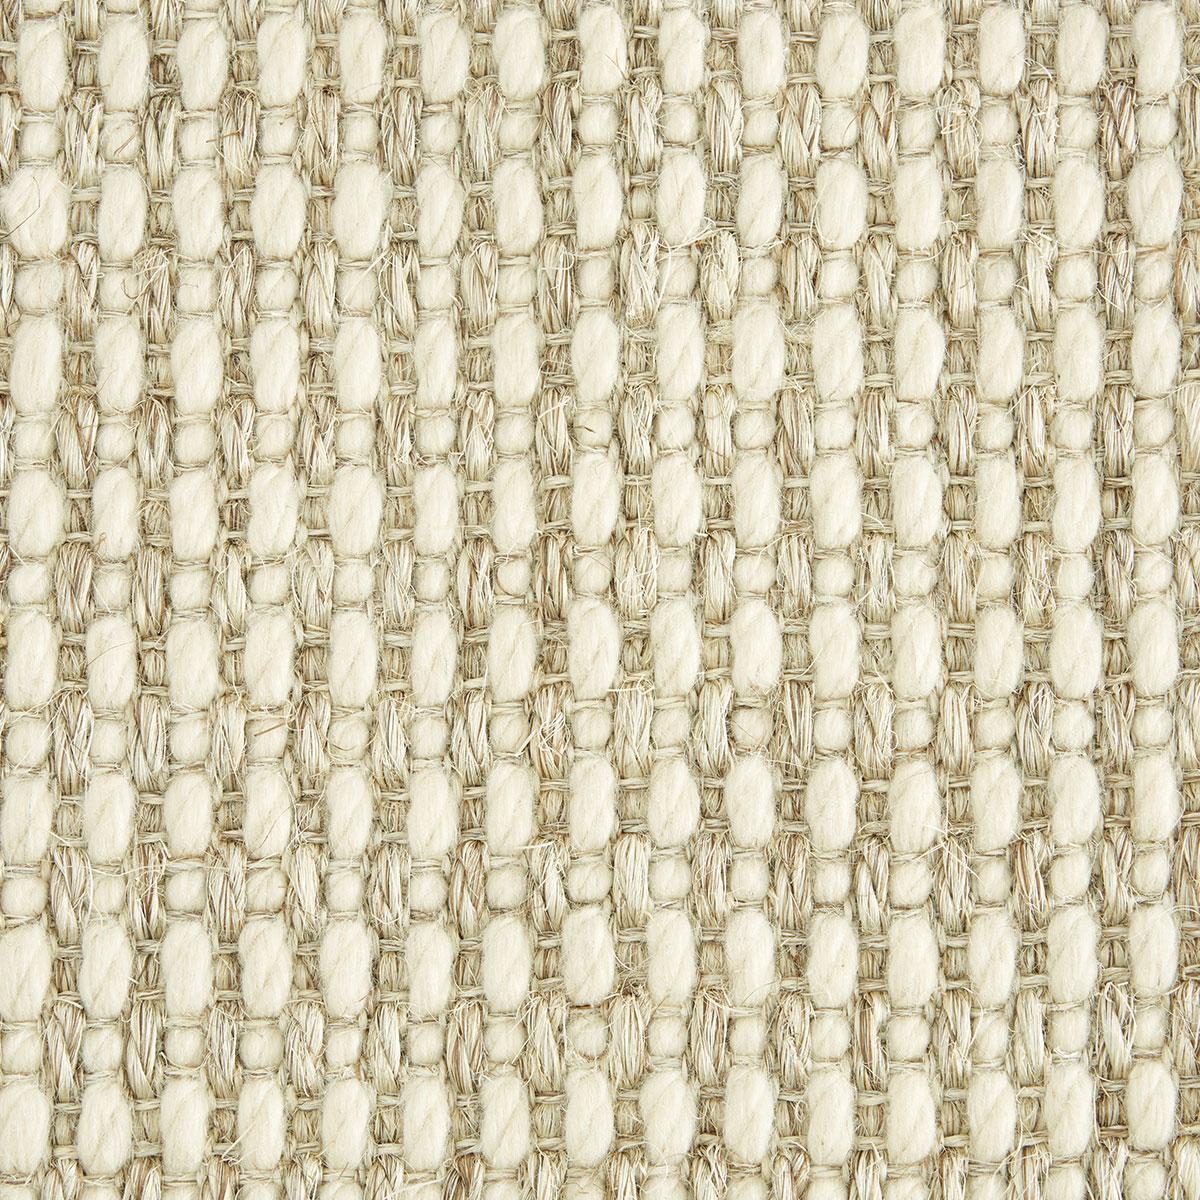 blenda_wool-sisal_broadloom_patterson-flynn-martin_pfm